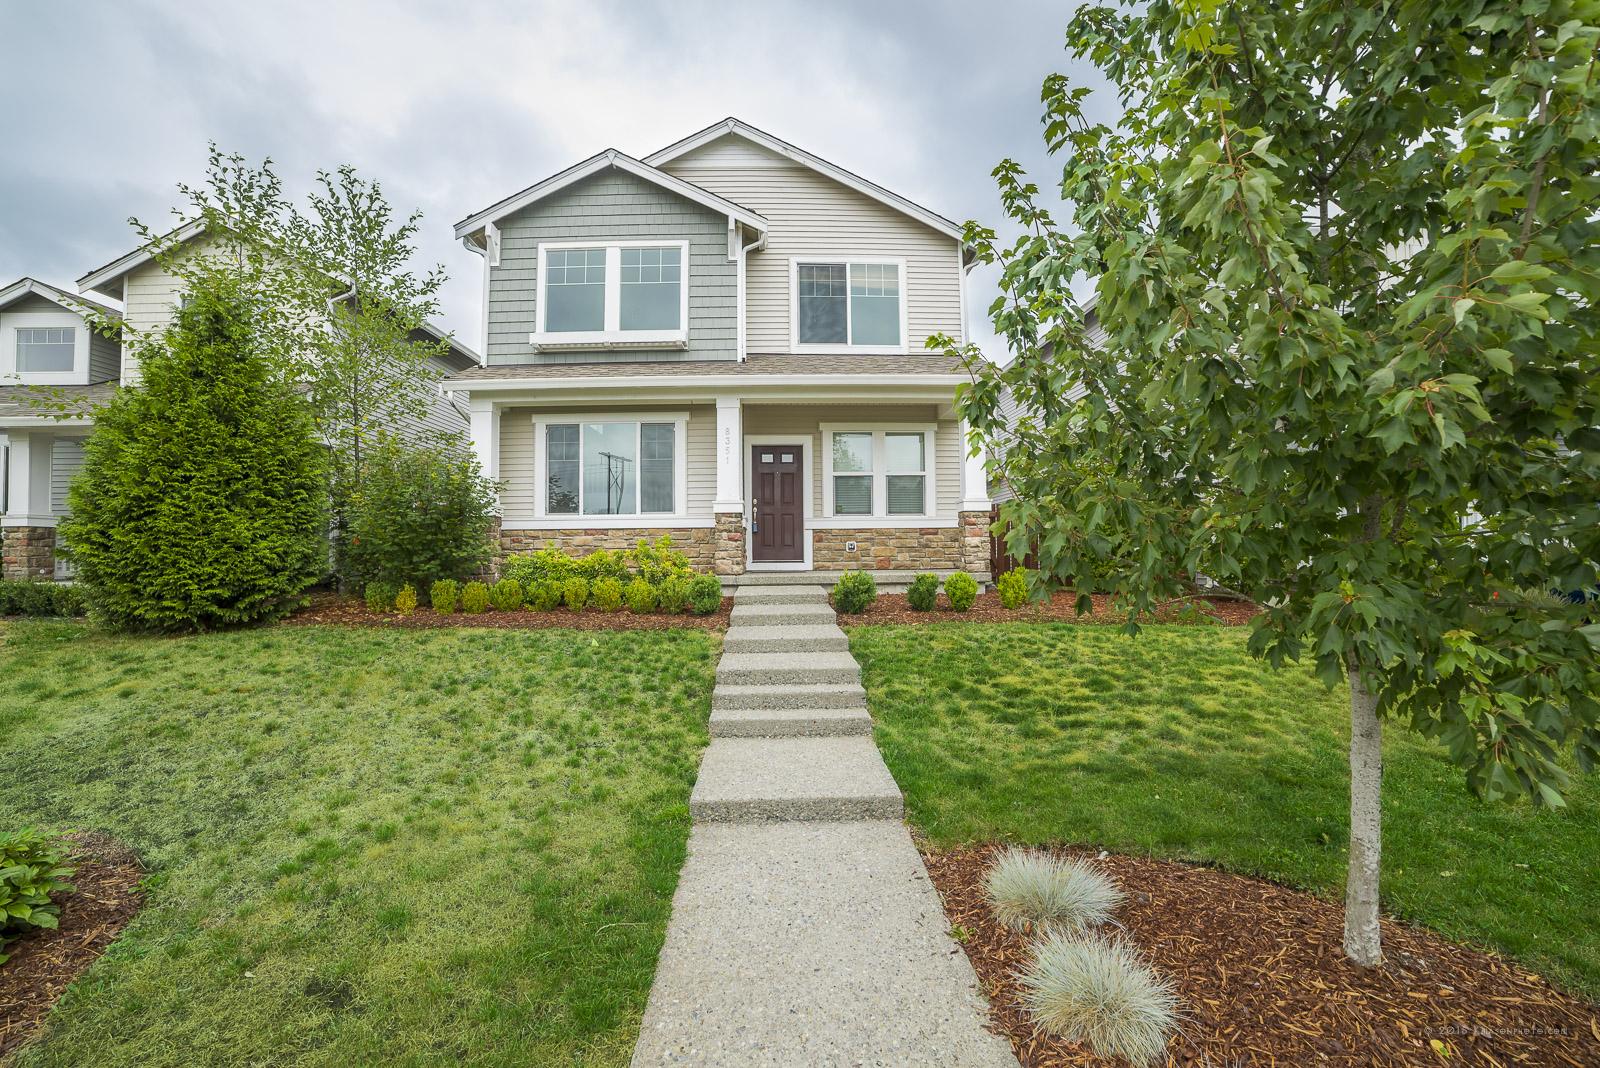 Selling My Lake Stevens Home